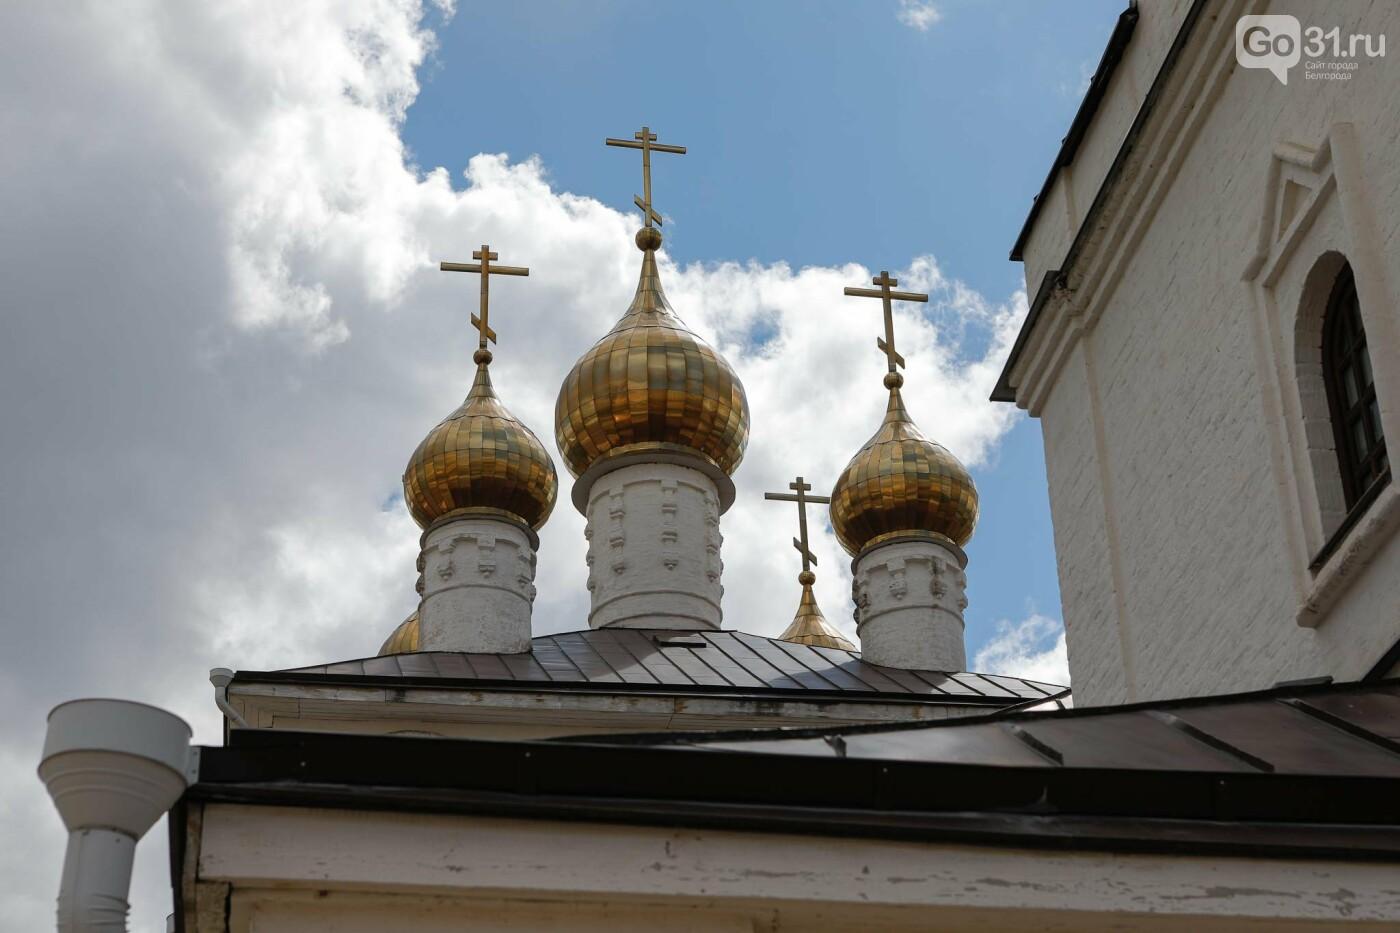 В Марфо-Мариинском монастыре Белгорода открыли пункт вакцинации от ковида, Фото: Антон Вергун